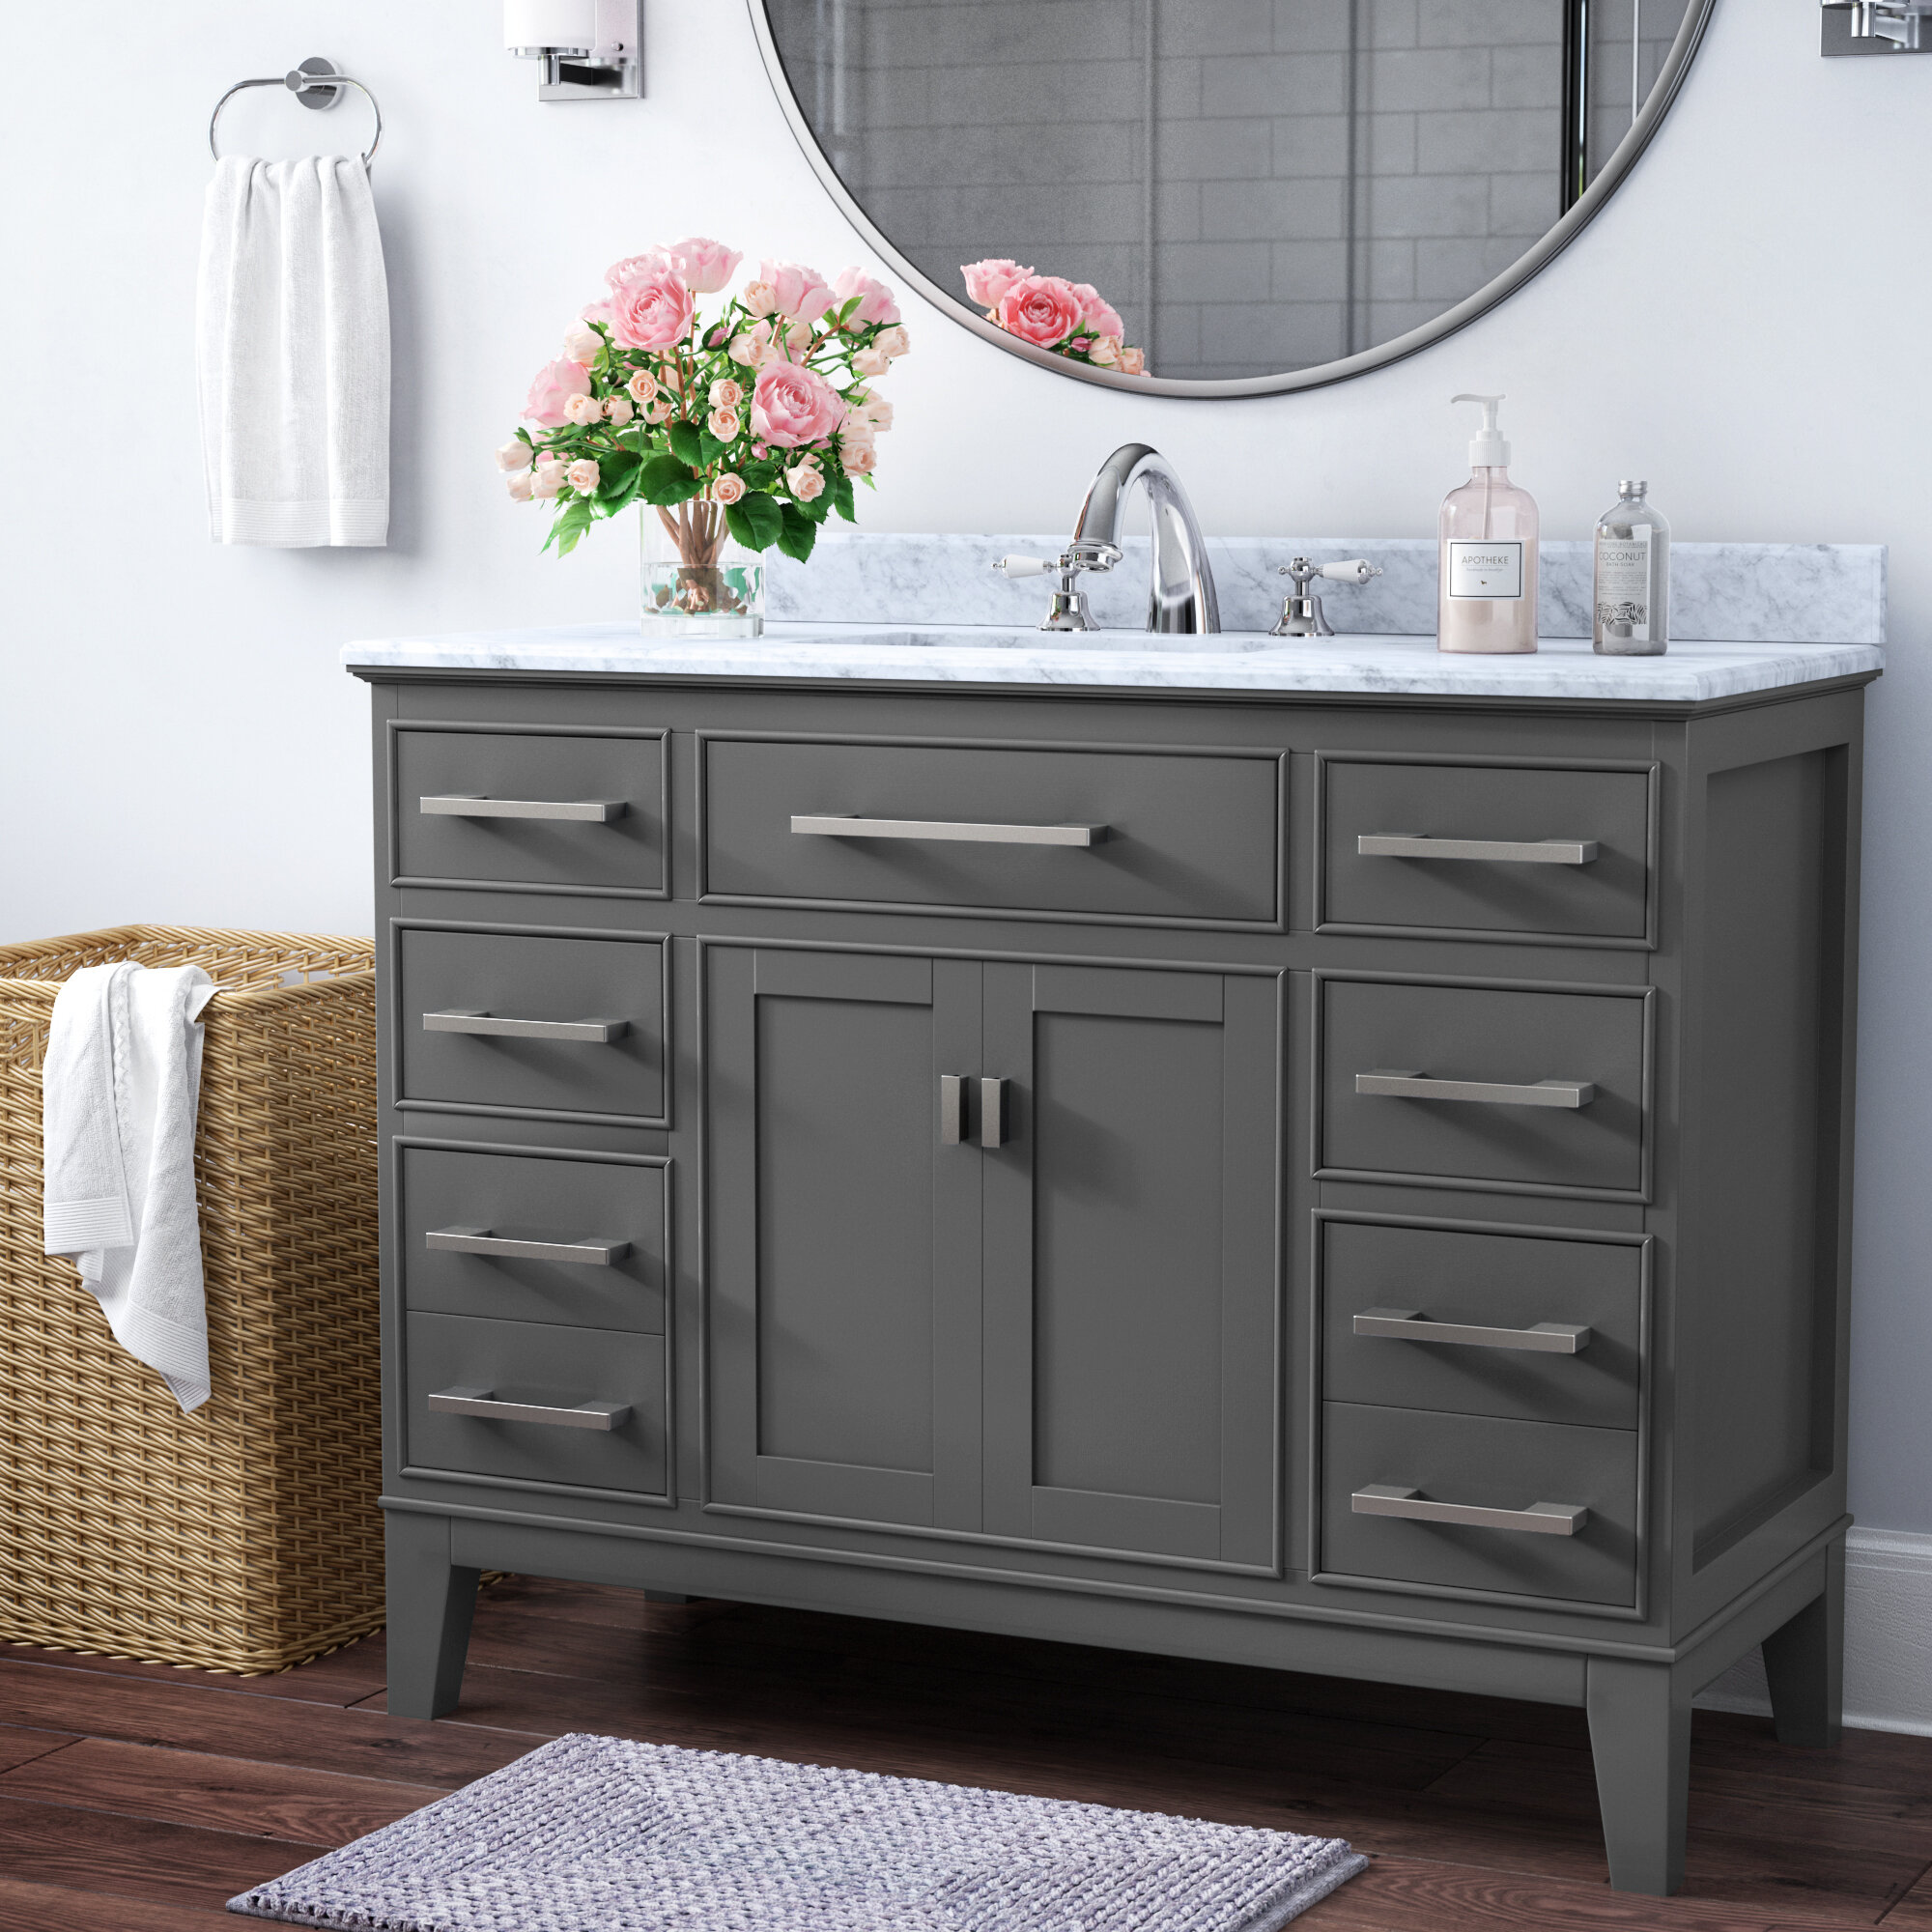 Charlton Home Arminta 48 Single Bathroom Vanity Set Reviews Wayfair